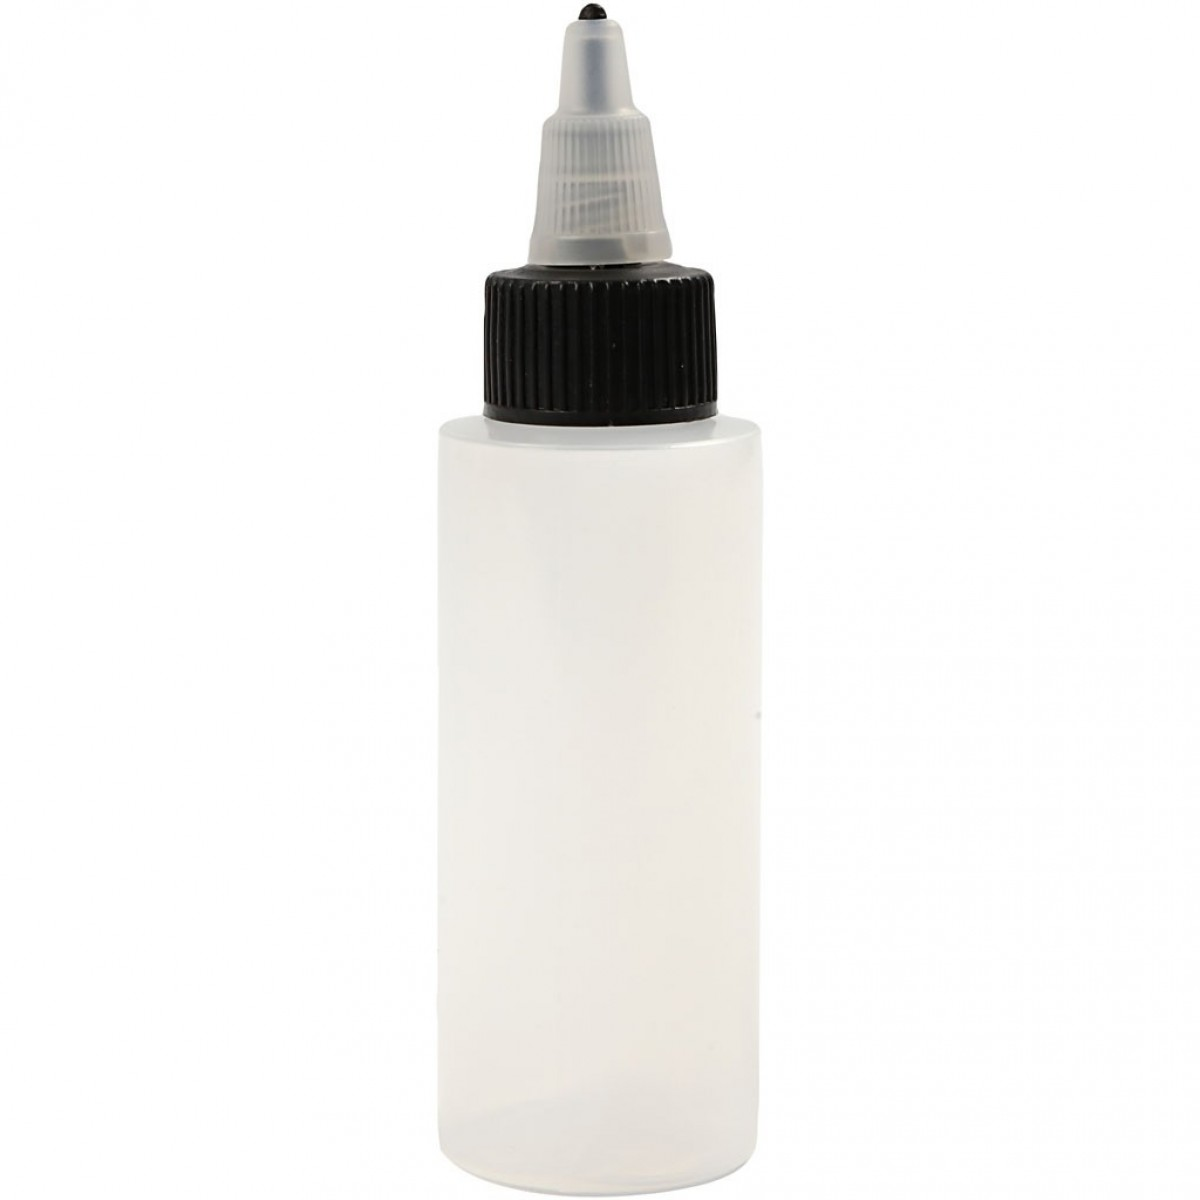 Tegneflaske, plast, skrue spids, 60 ml. (tom)